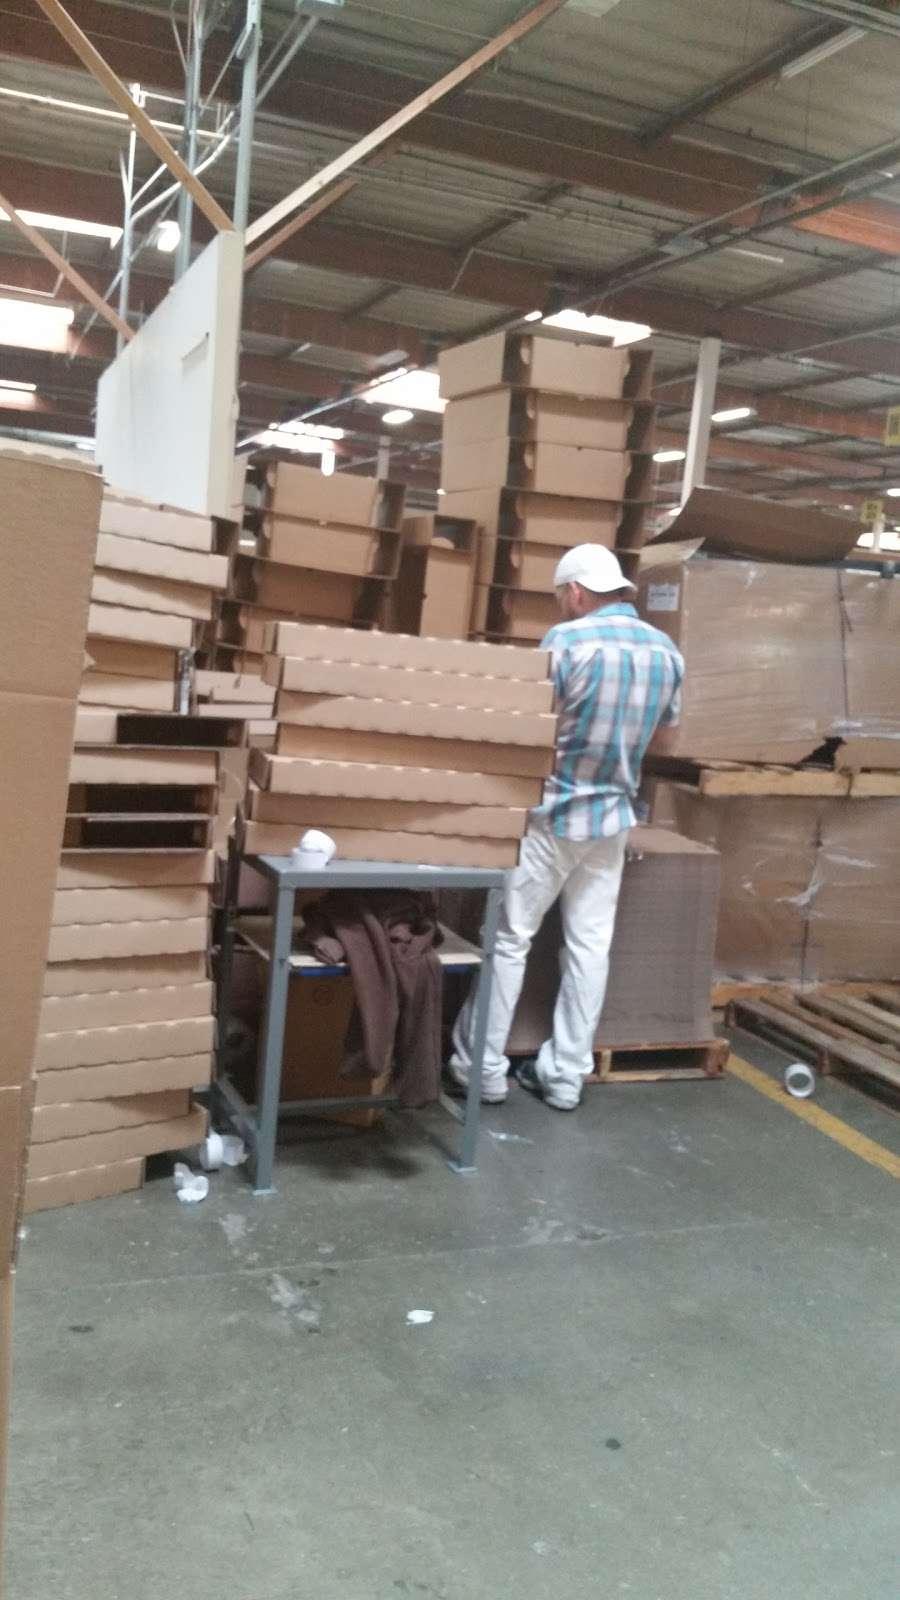 Exemplis - storage  | Photo 9 of 10 | Address: 6280 Artesia Blvd, Buena Park, CA 90620, USA | Phone: (888) 274-8664